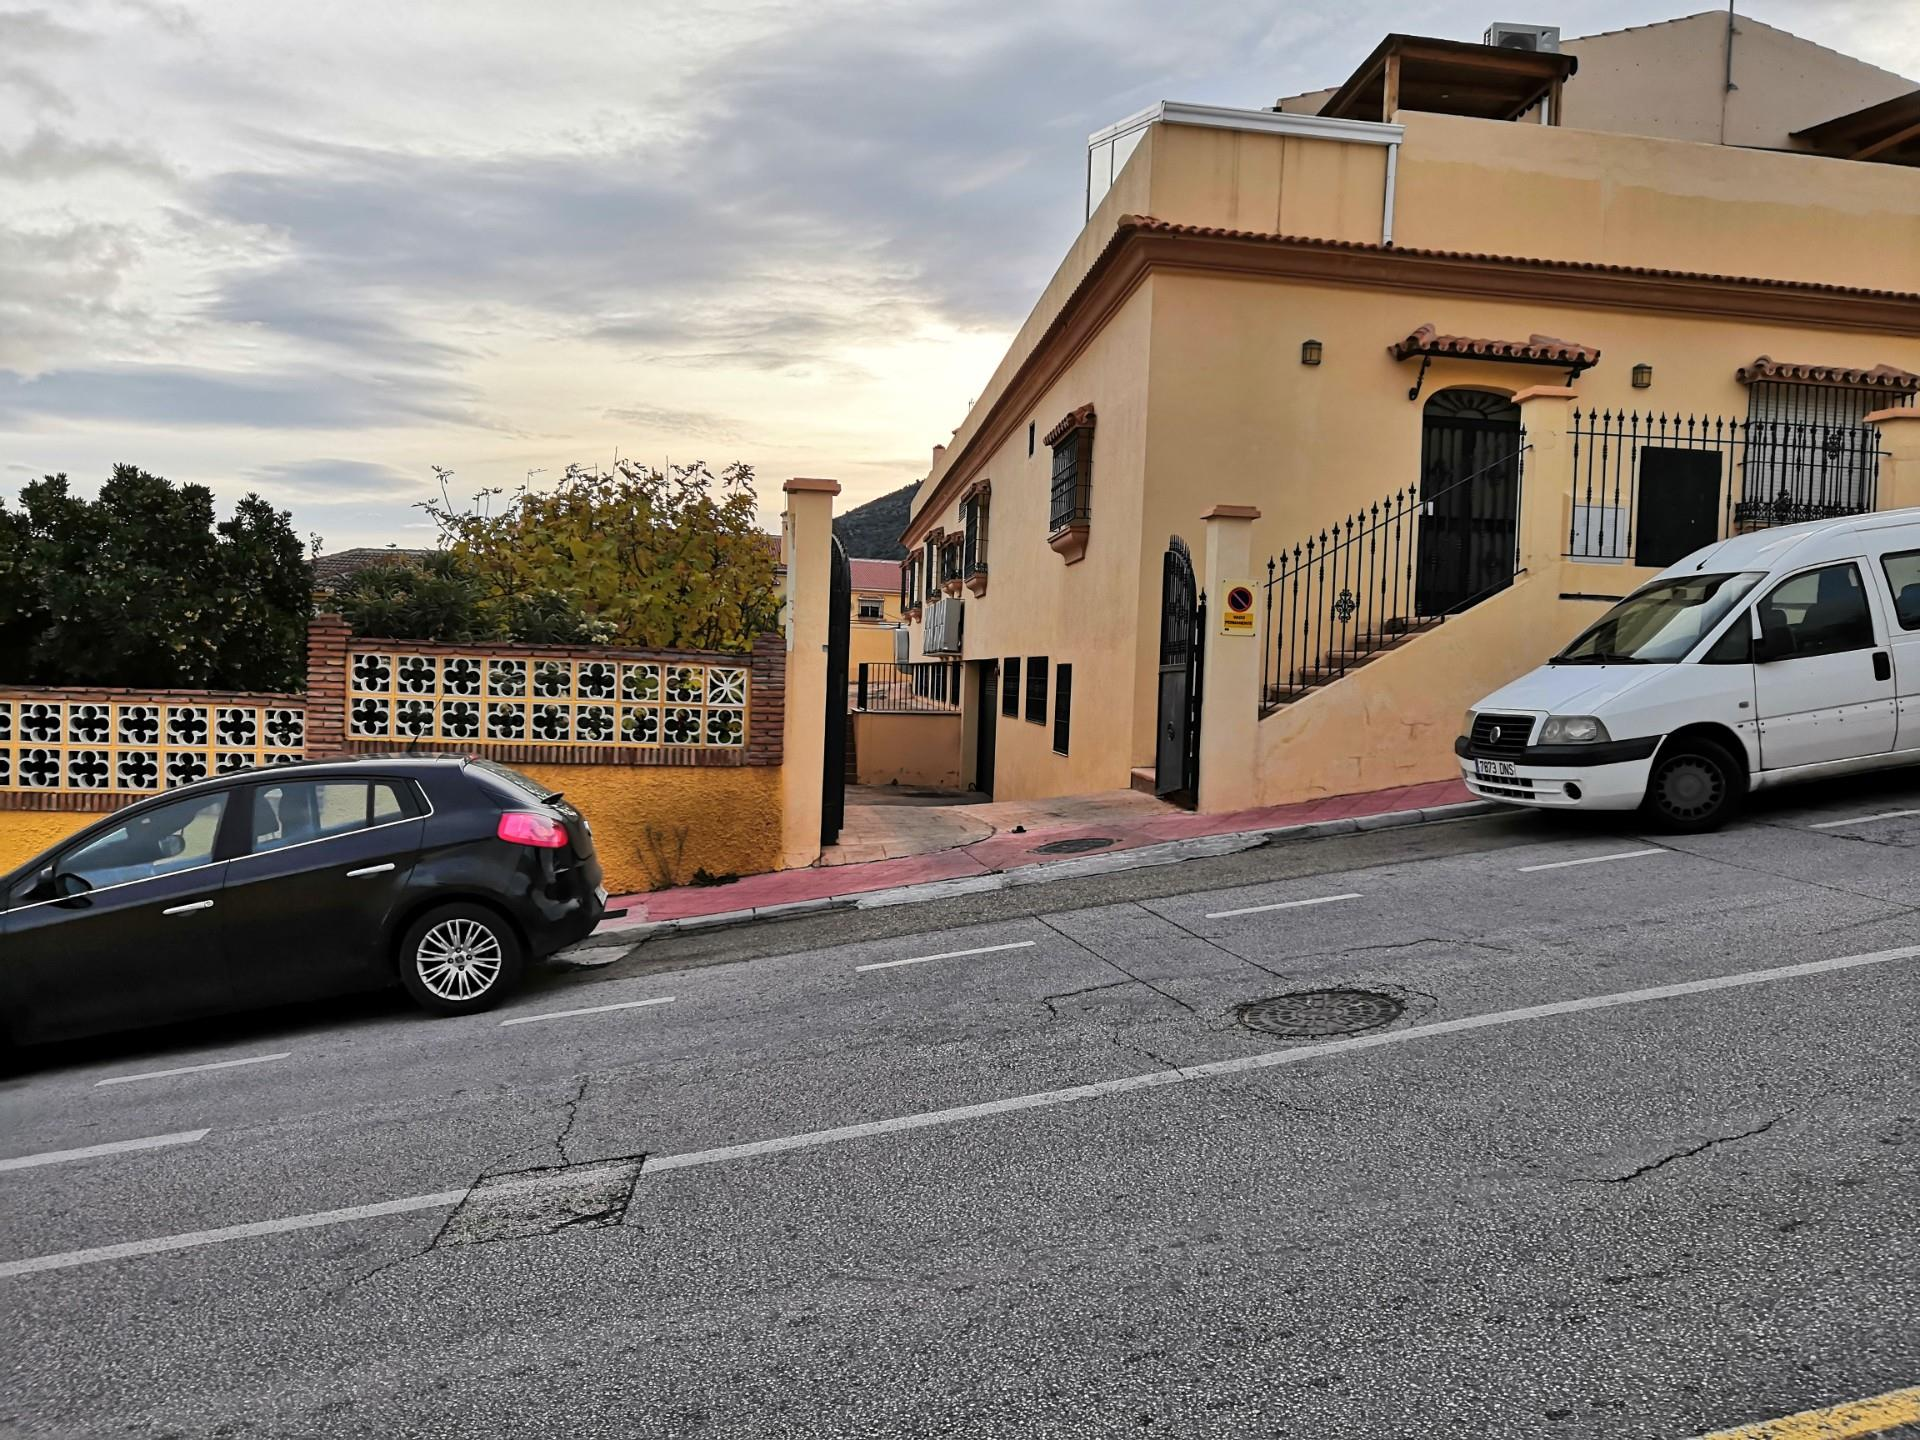 Garaje de alquiler en Avenida Malagueñas, 1a Jardines de Alhaurín - Huerta Alta - Fuensanguínea (Alhaurín de la Torre, Málaga)